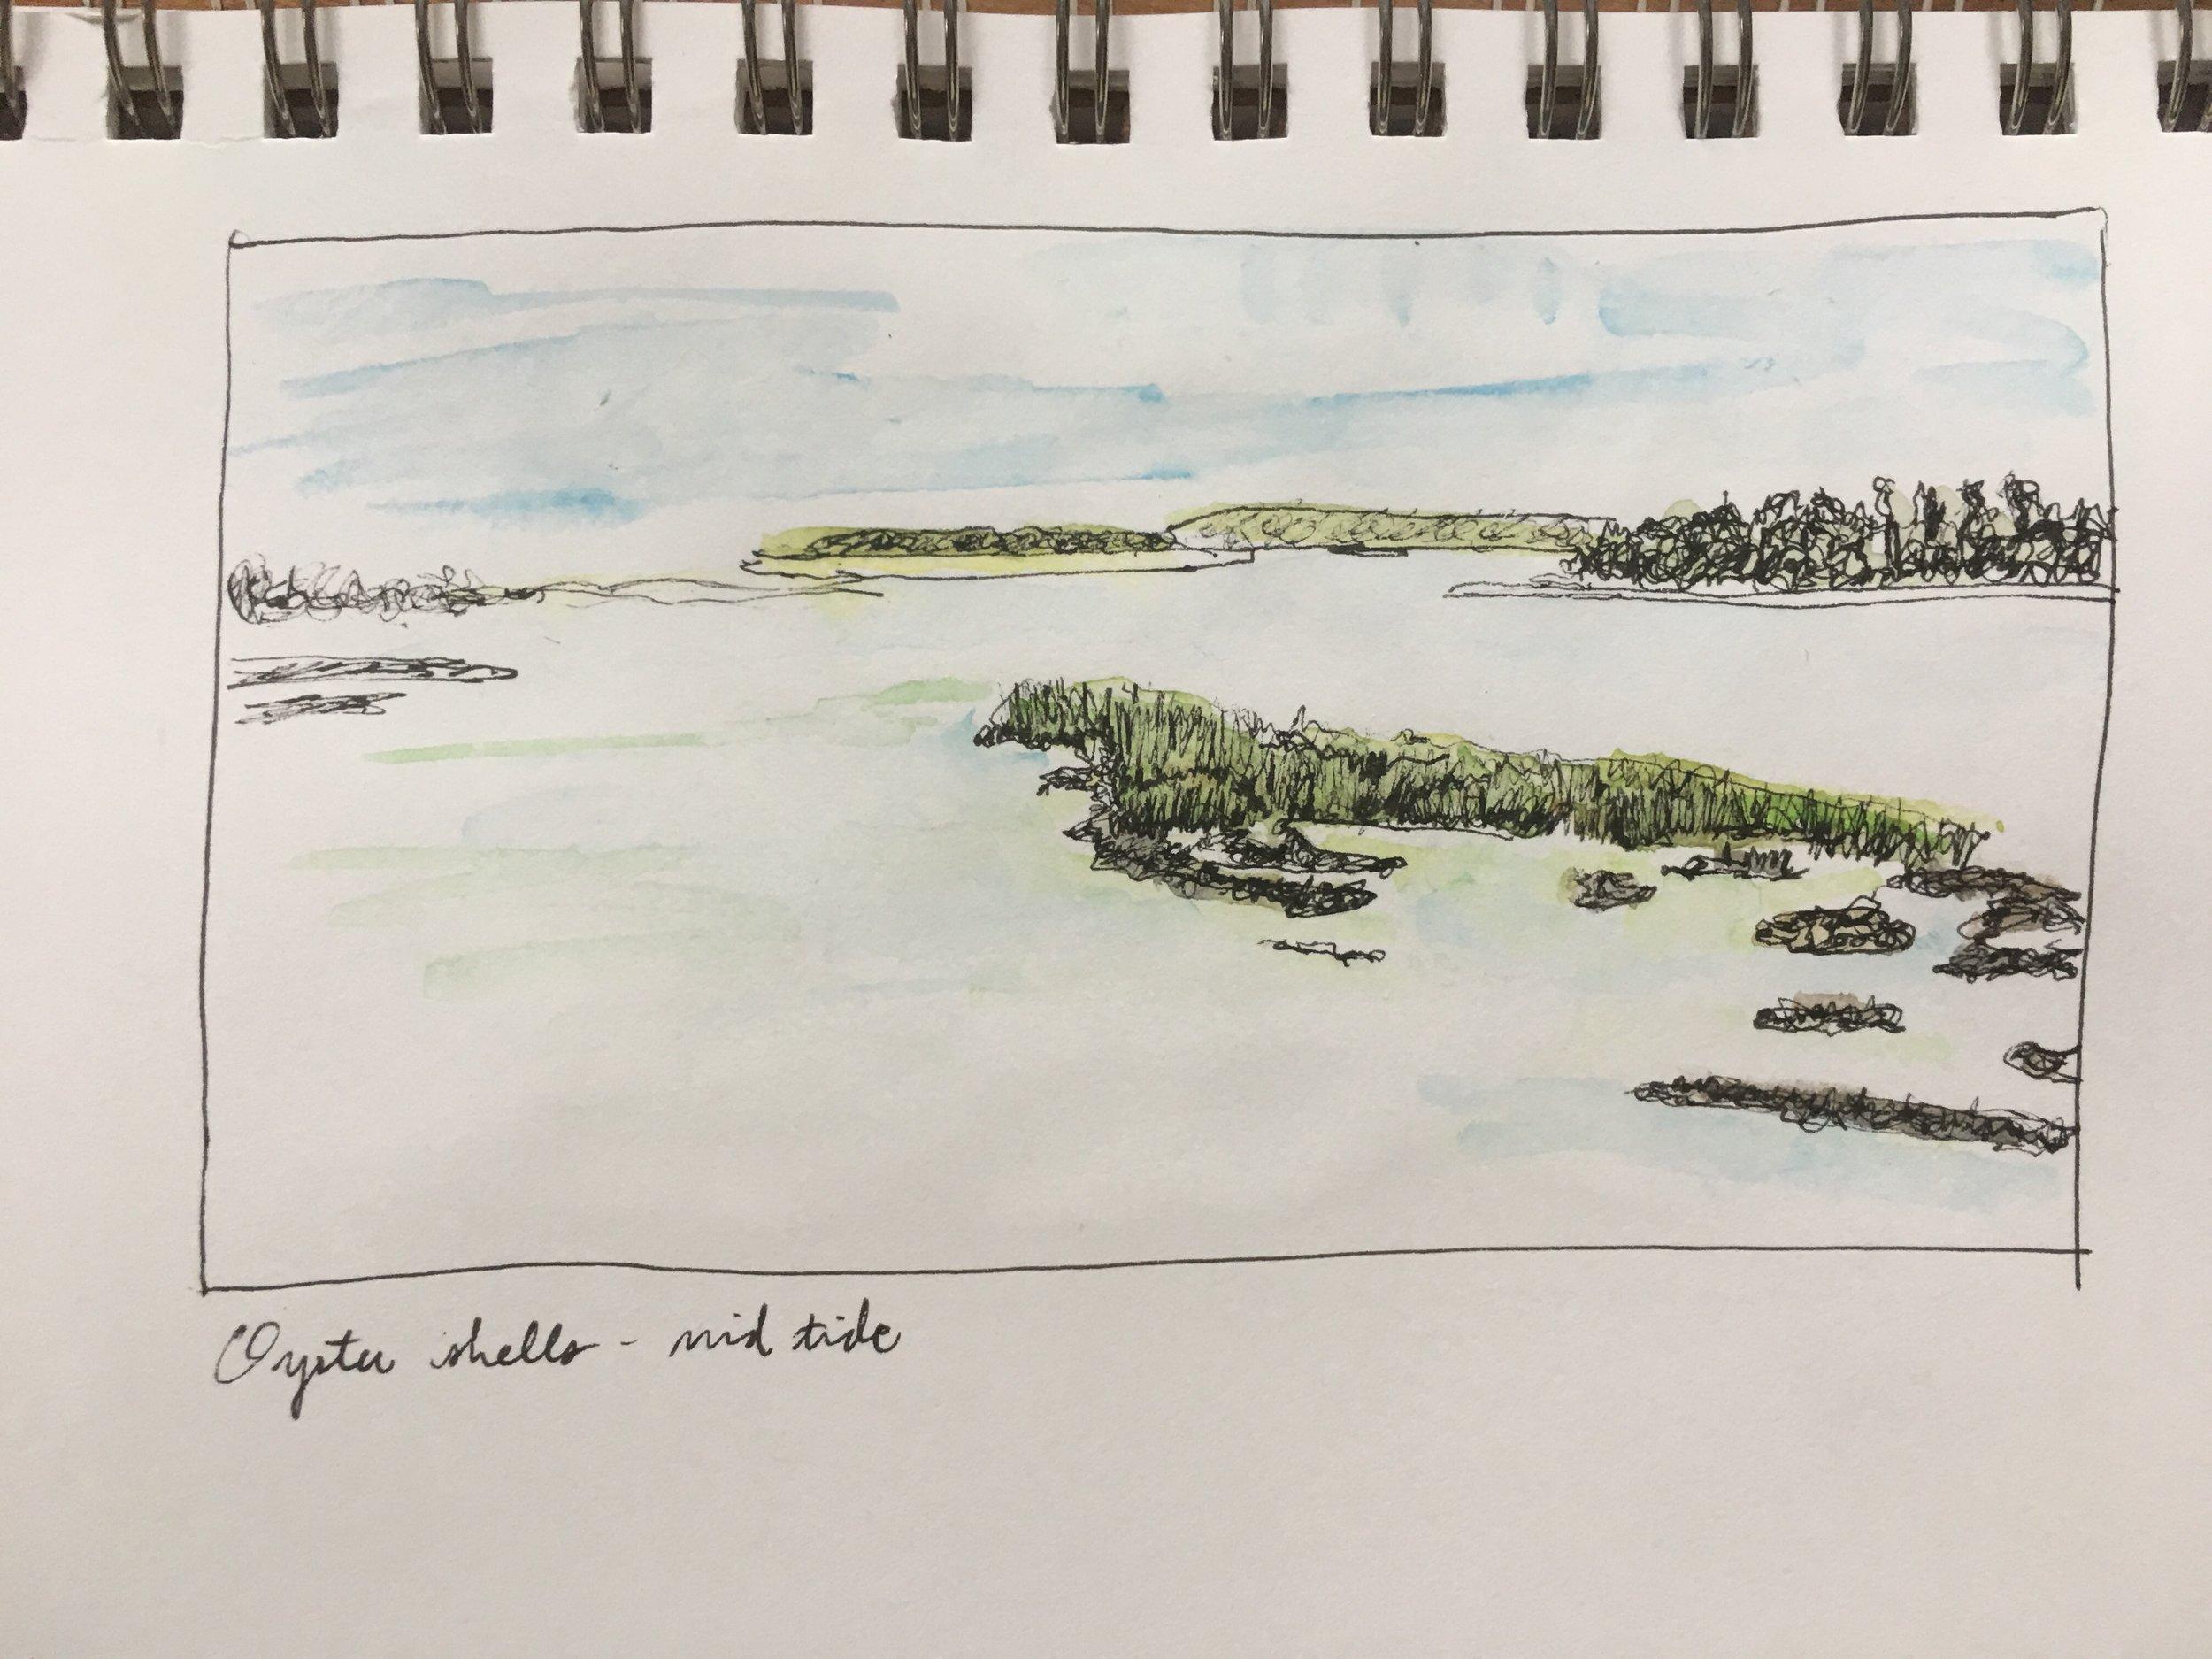 Oyster Shells, mid-tide, Hilton Head, SC